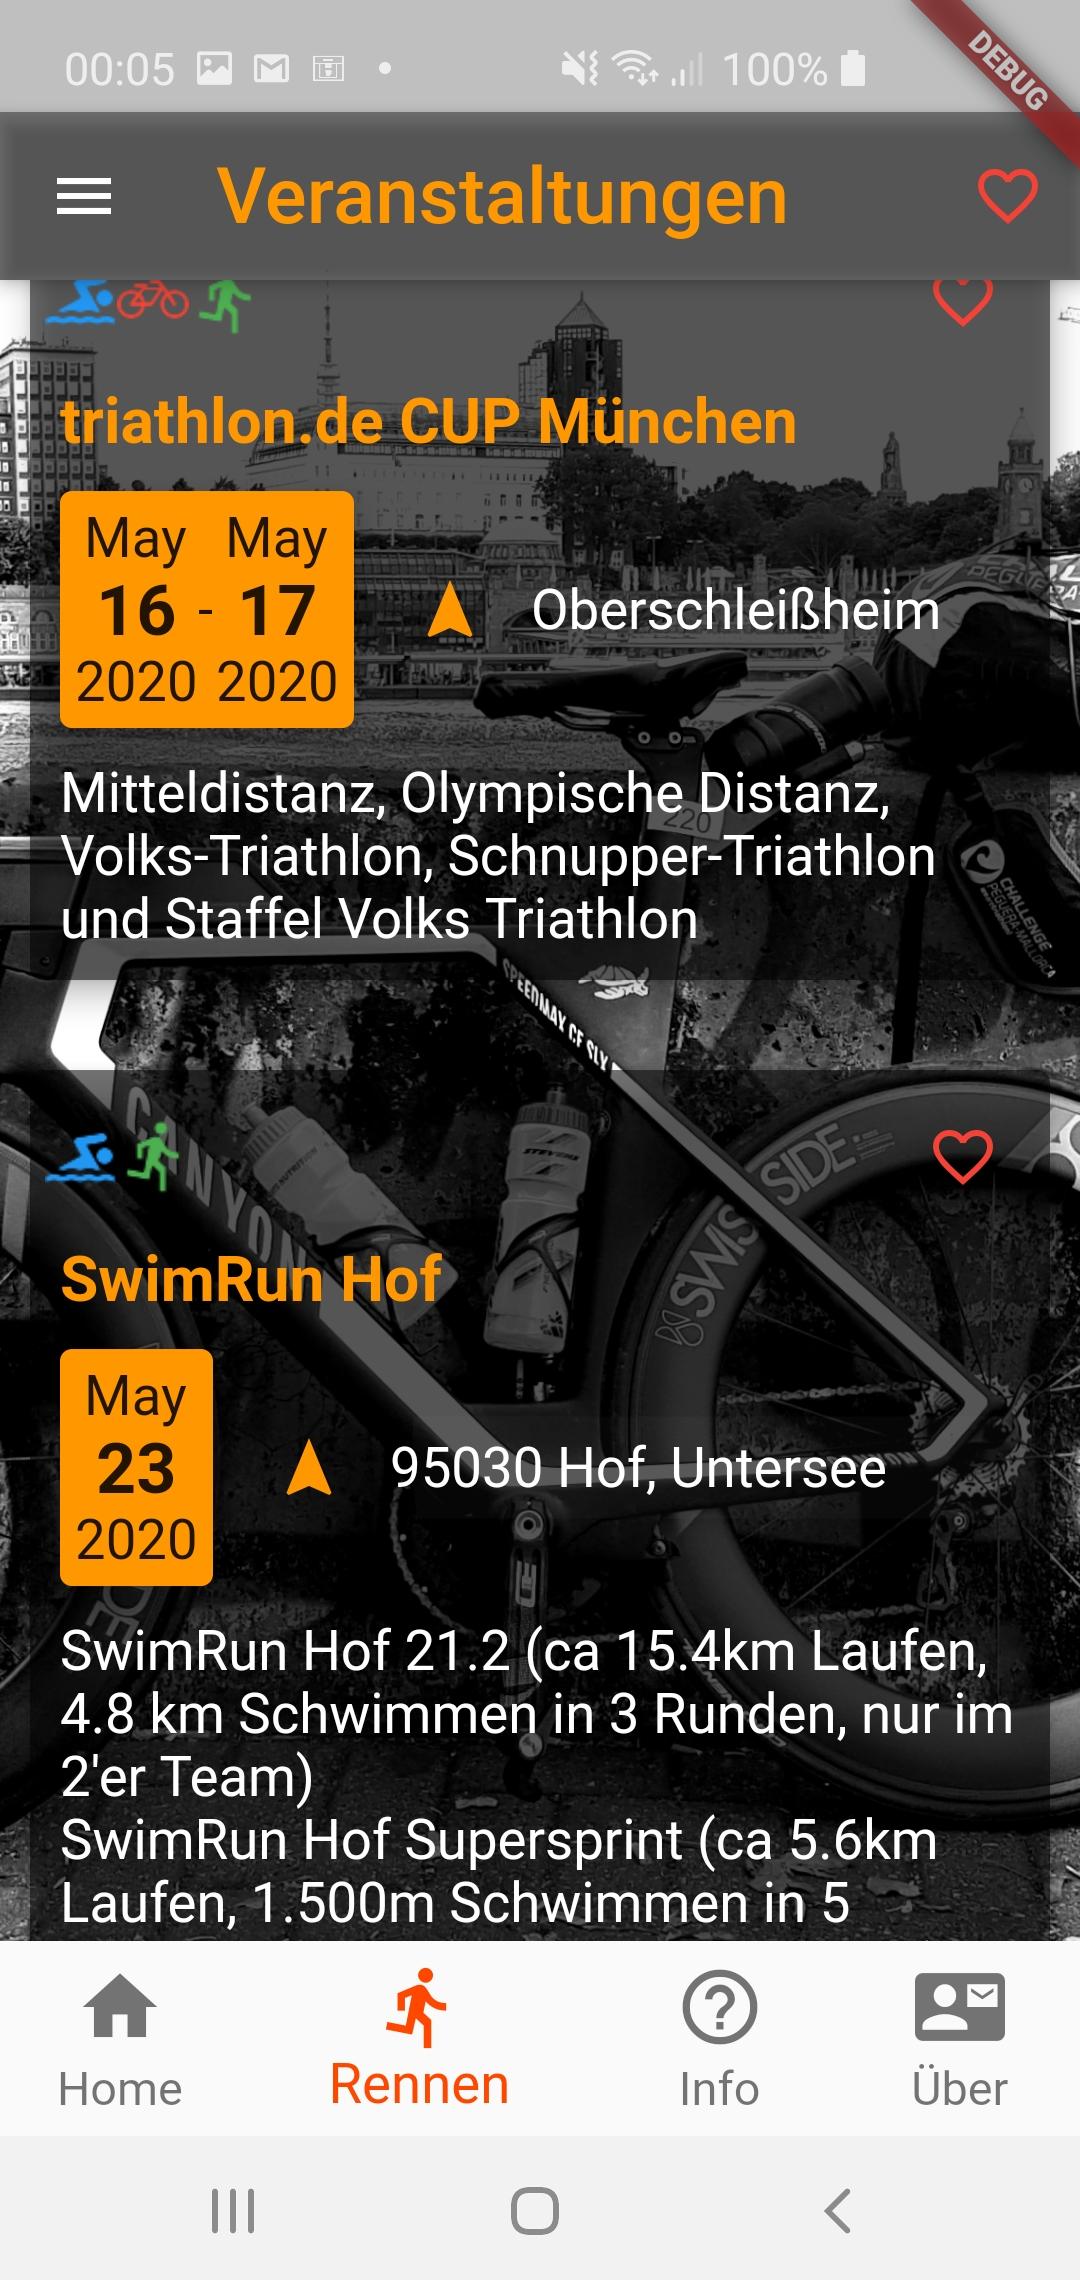 Android App - Triathlon Veranstaltungen